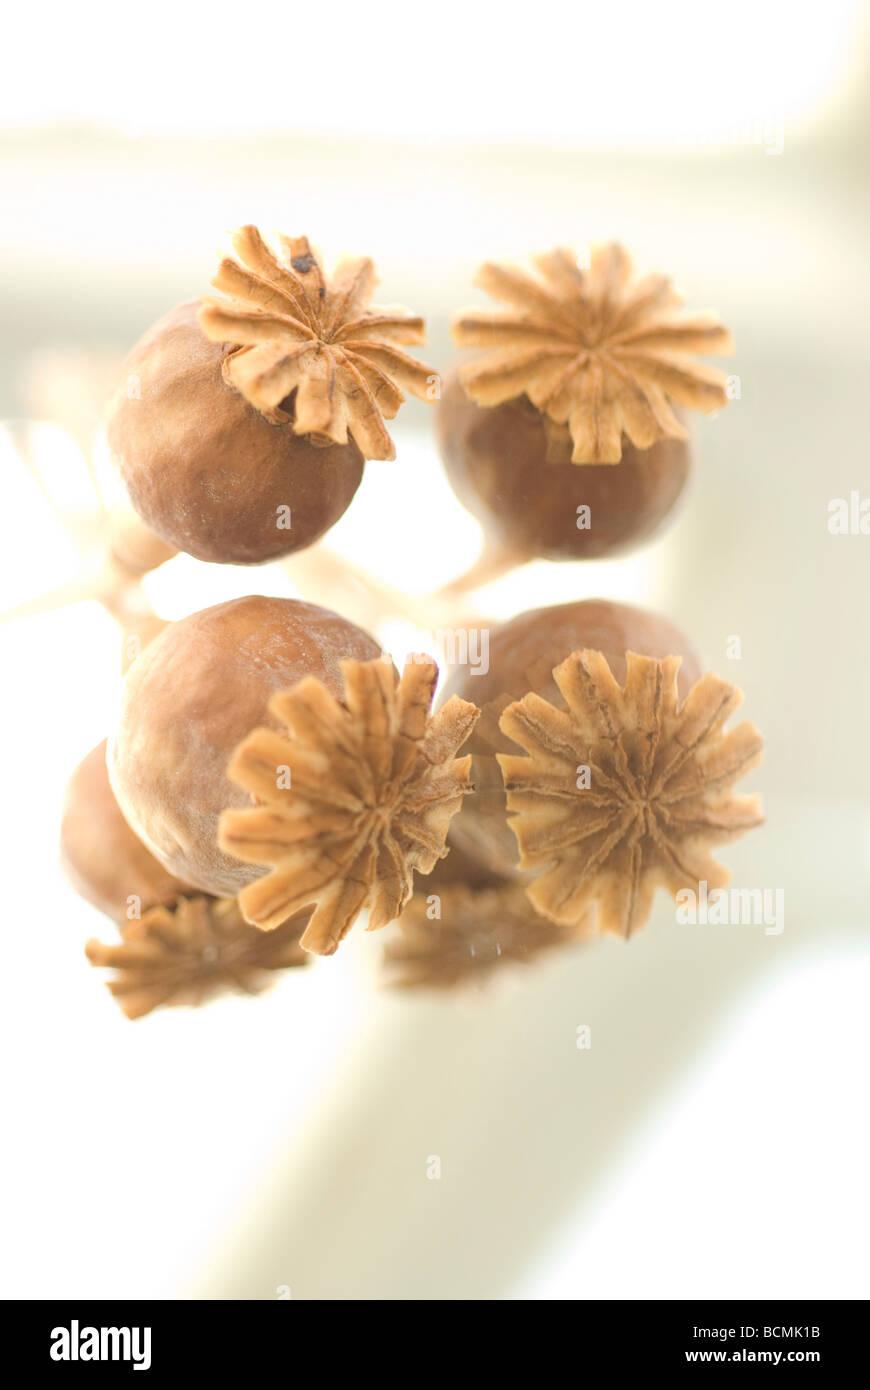 Dry Poppy Flower Head Stock Photos Dry Poppy Flower Head Stock